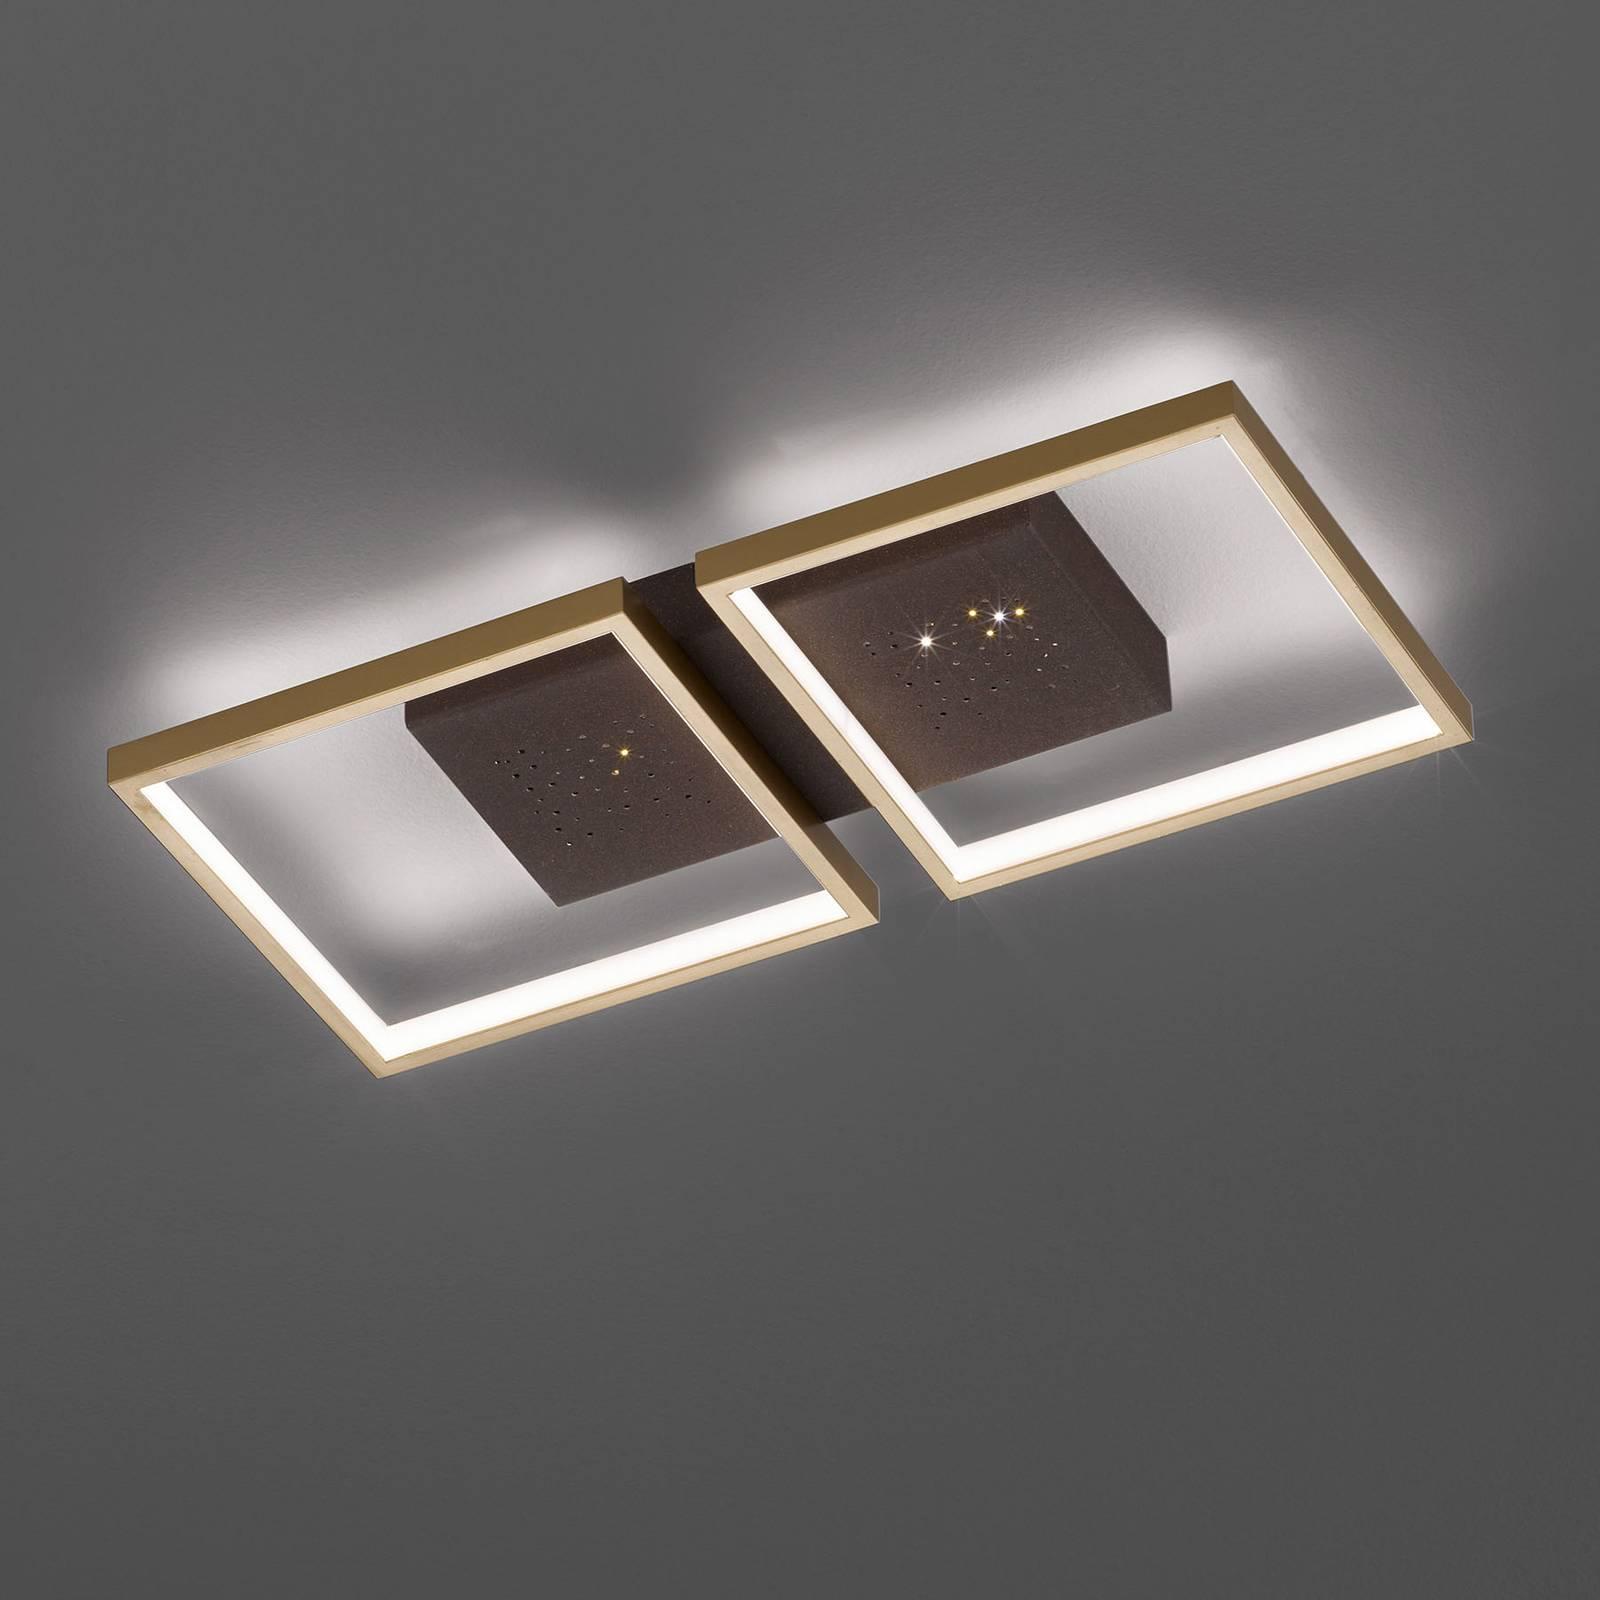 LED-kattovalaisin Pix, 2-lamppuinen 54 x 25 cm